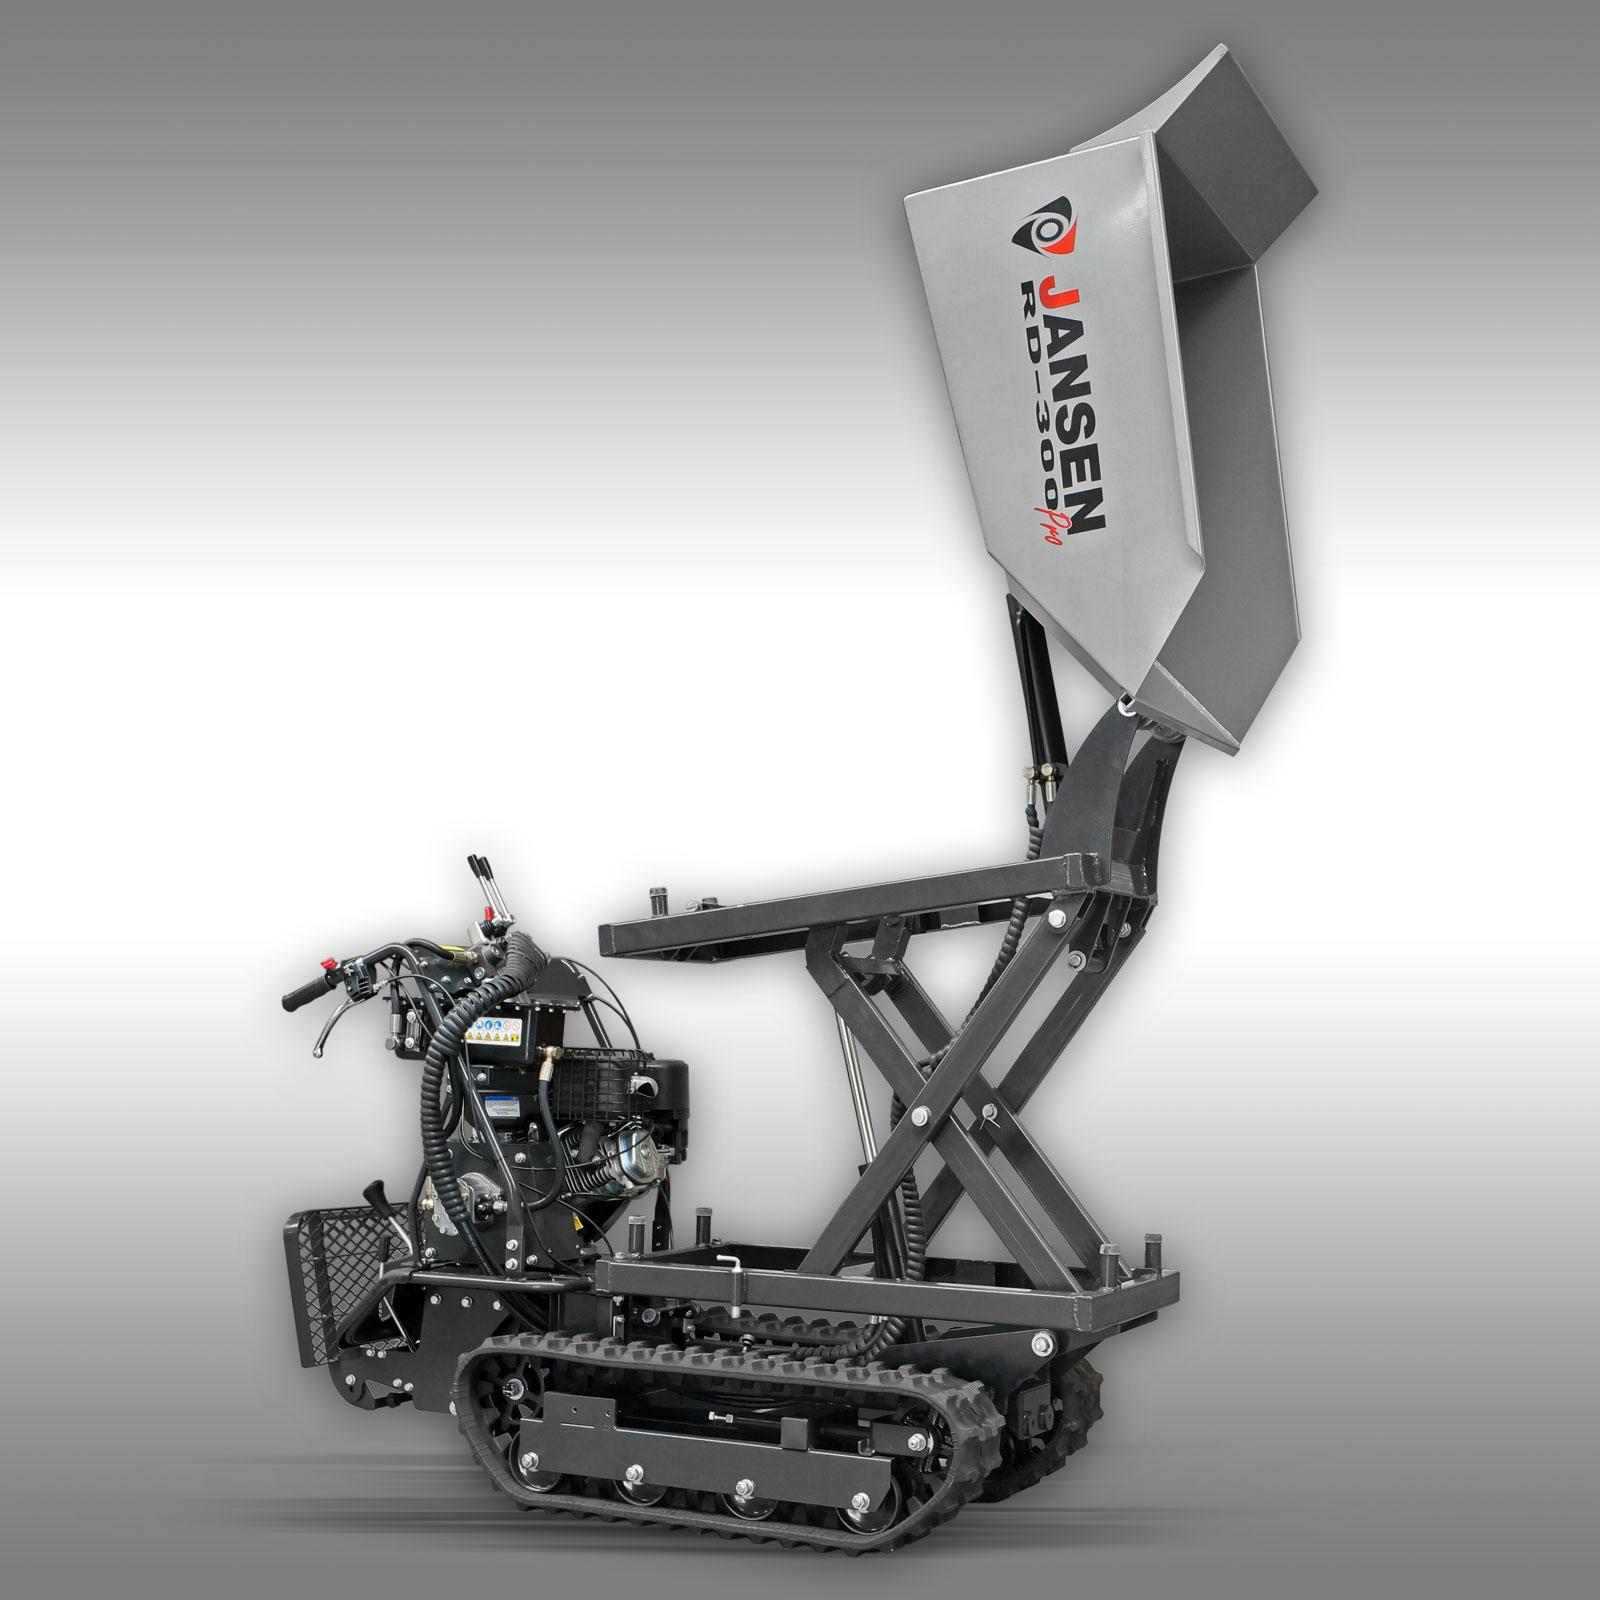 Jansen Rupsdumper RD-300PRO, hydraulische kiepbak, 9PK benzinemotor  hoogkiepsysteem